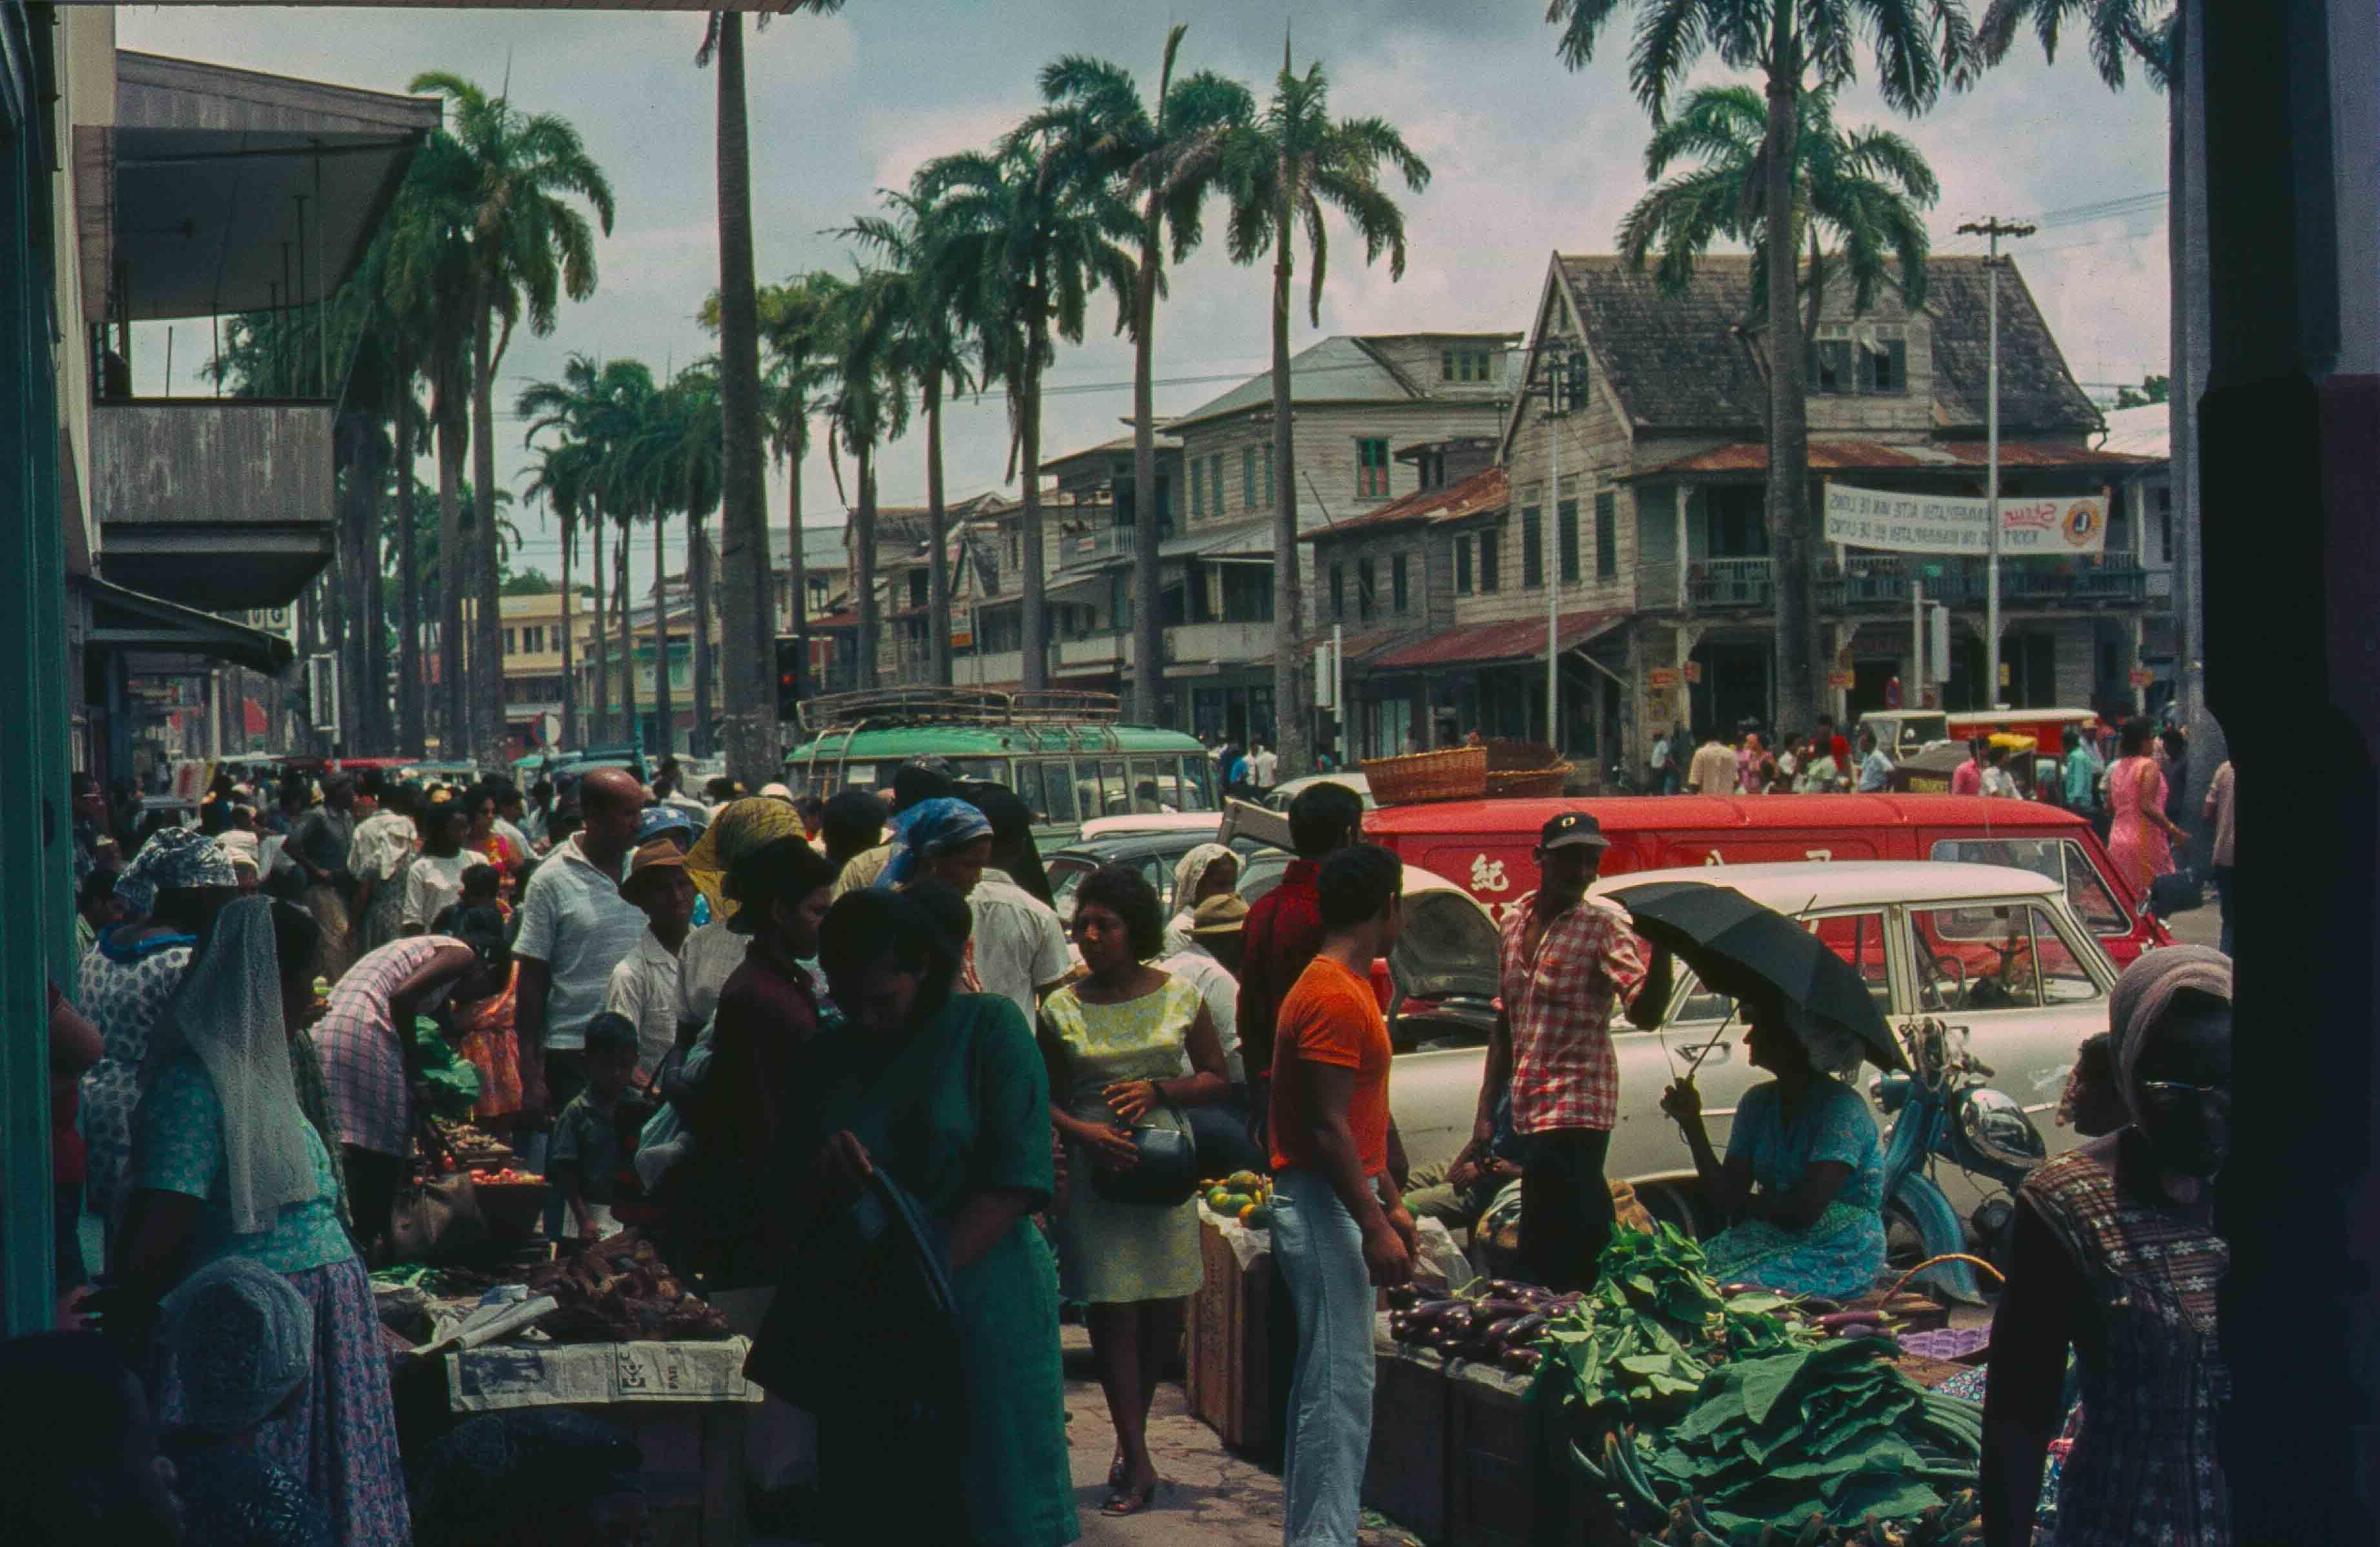 261. Suriname